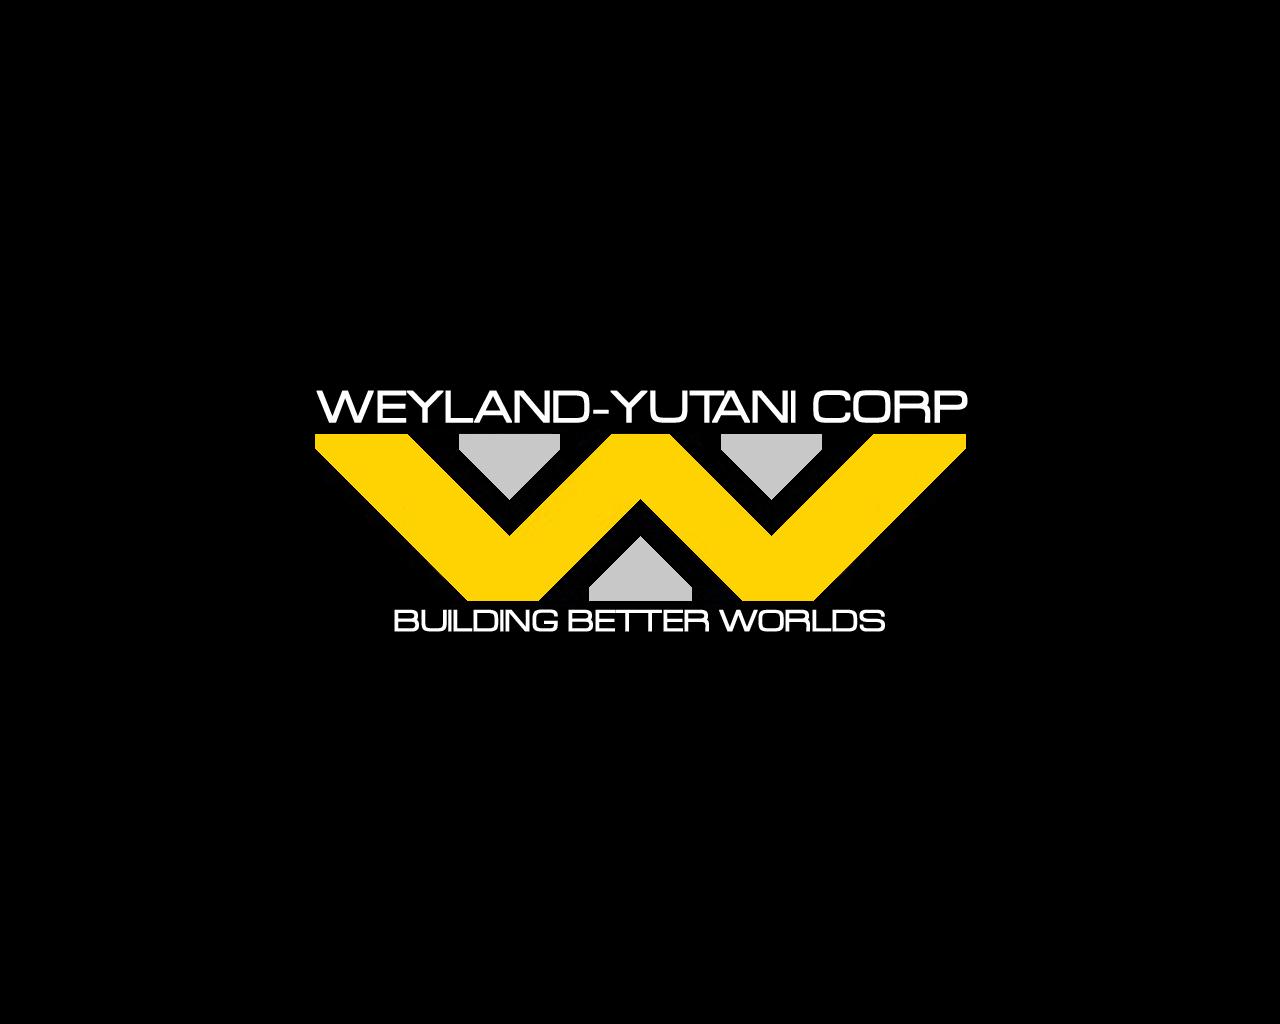 Weyland_Yutani_Corporation_by_Discretos